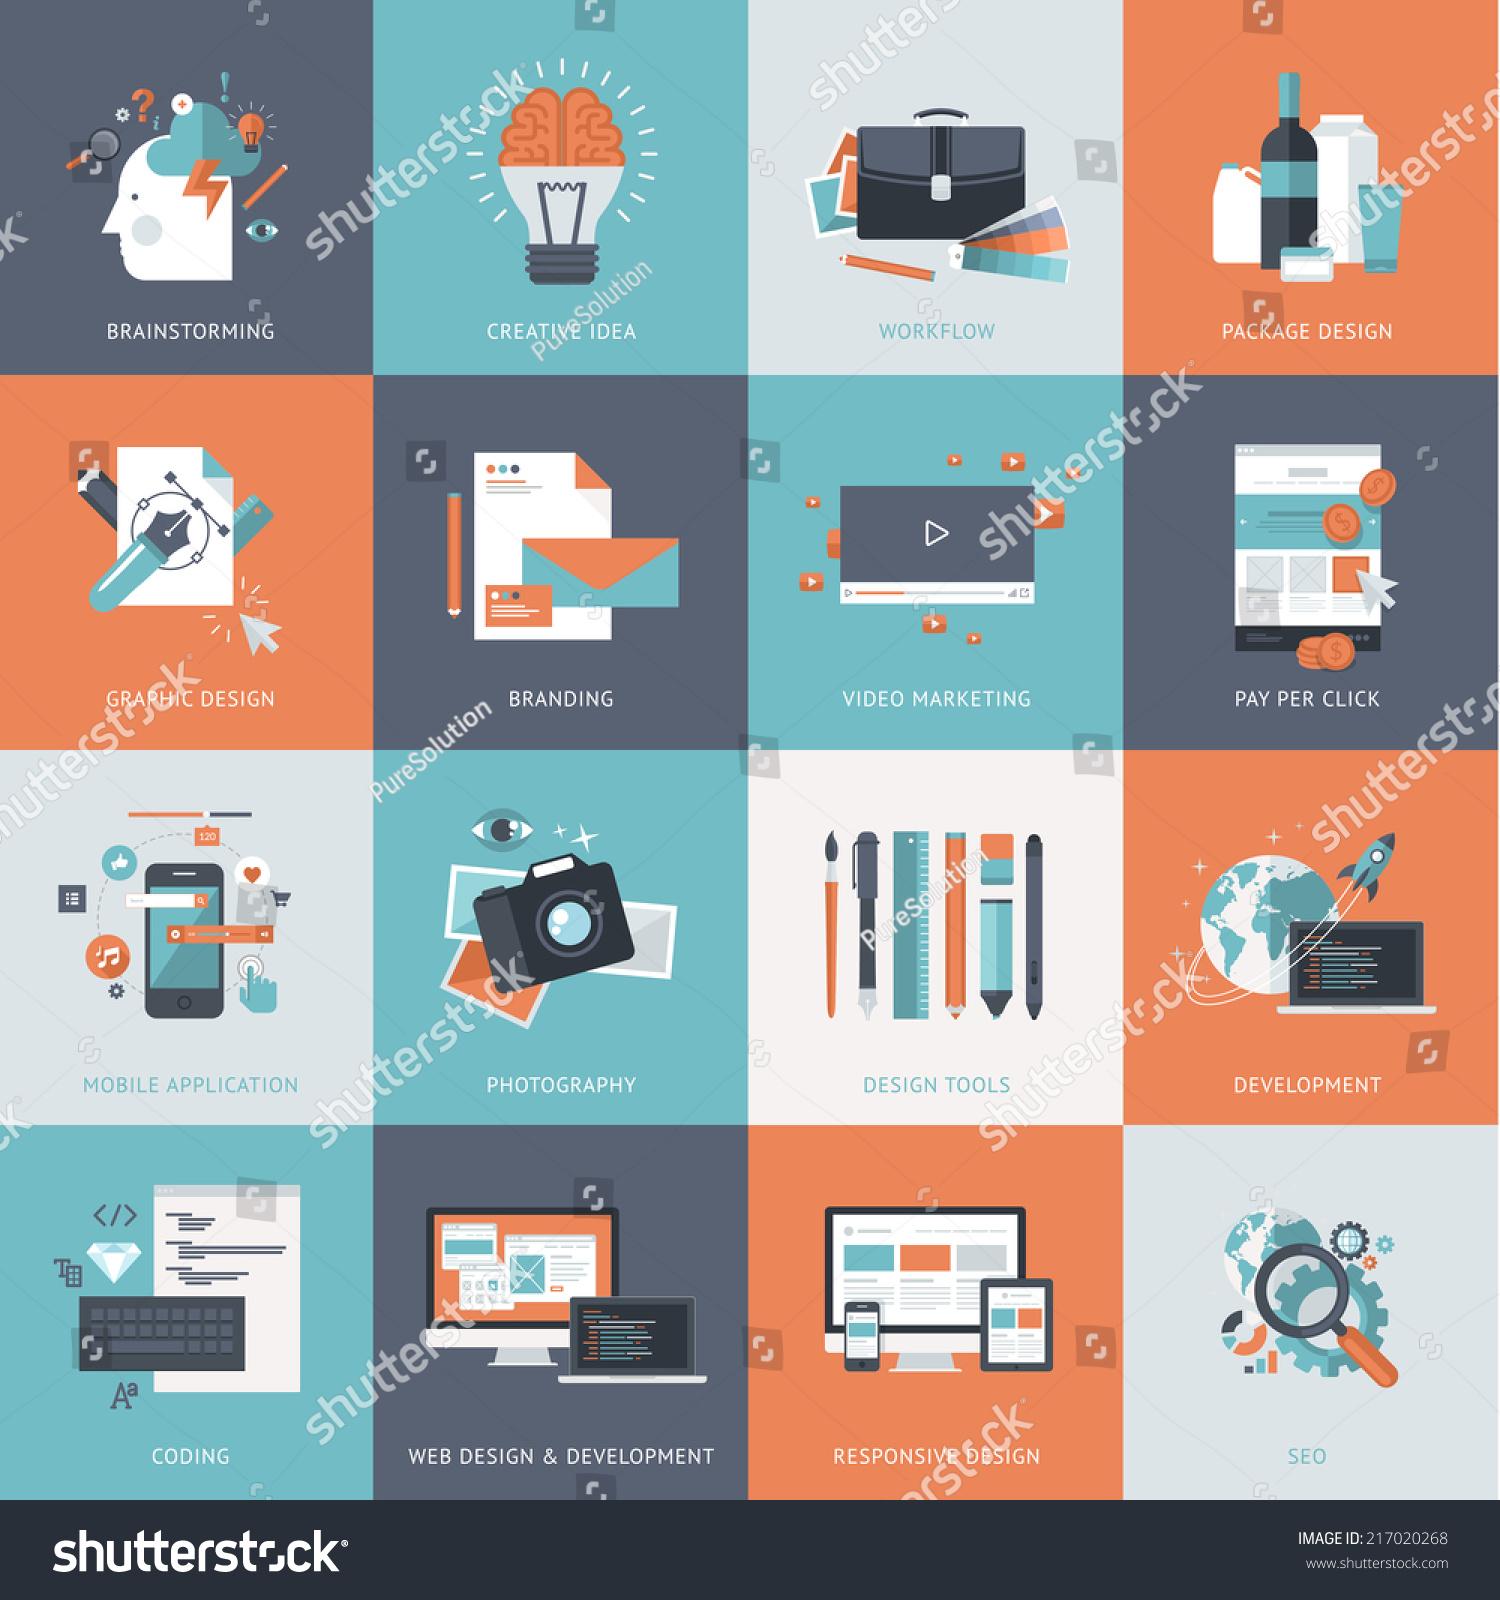 Calendar Concepts Graphic Design : Set flat design concept icons website stock vector